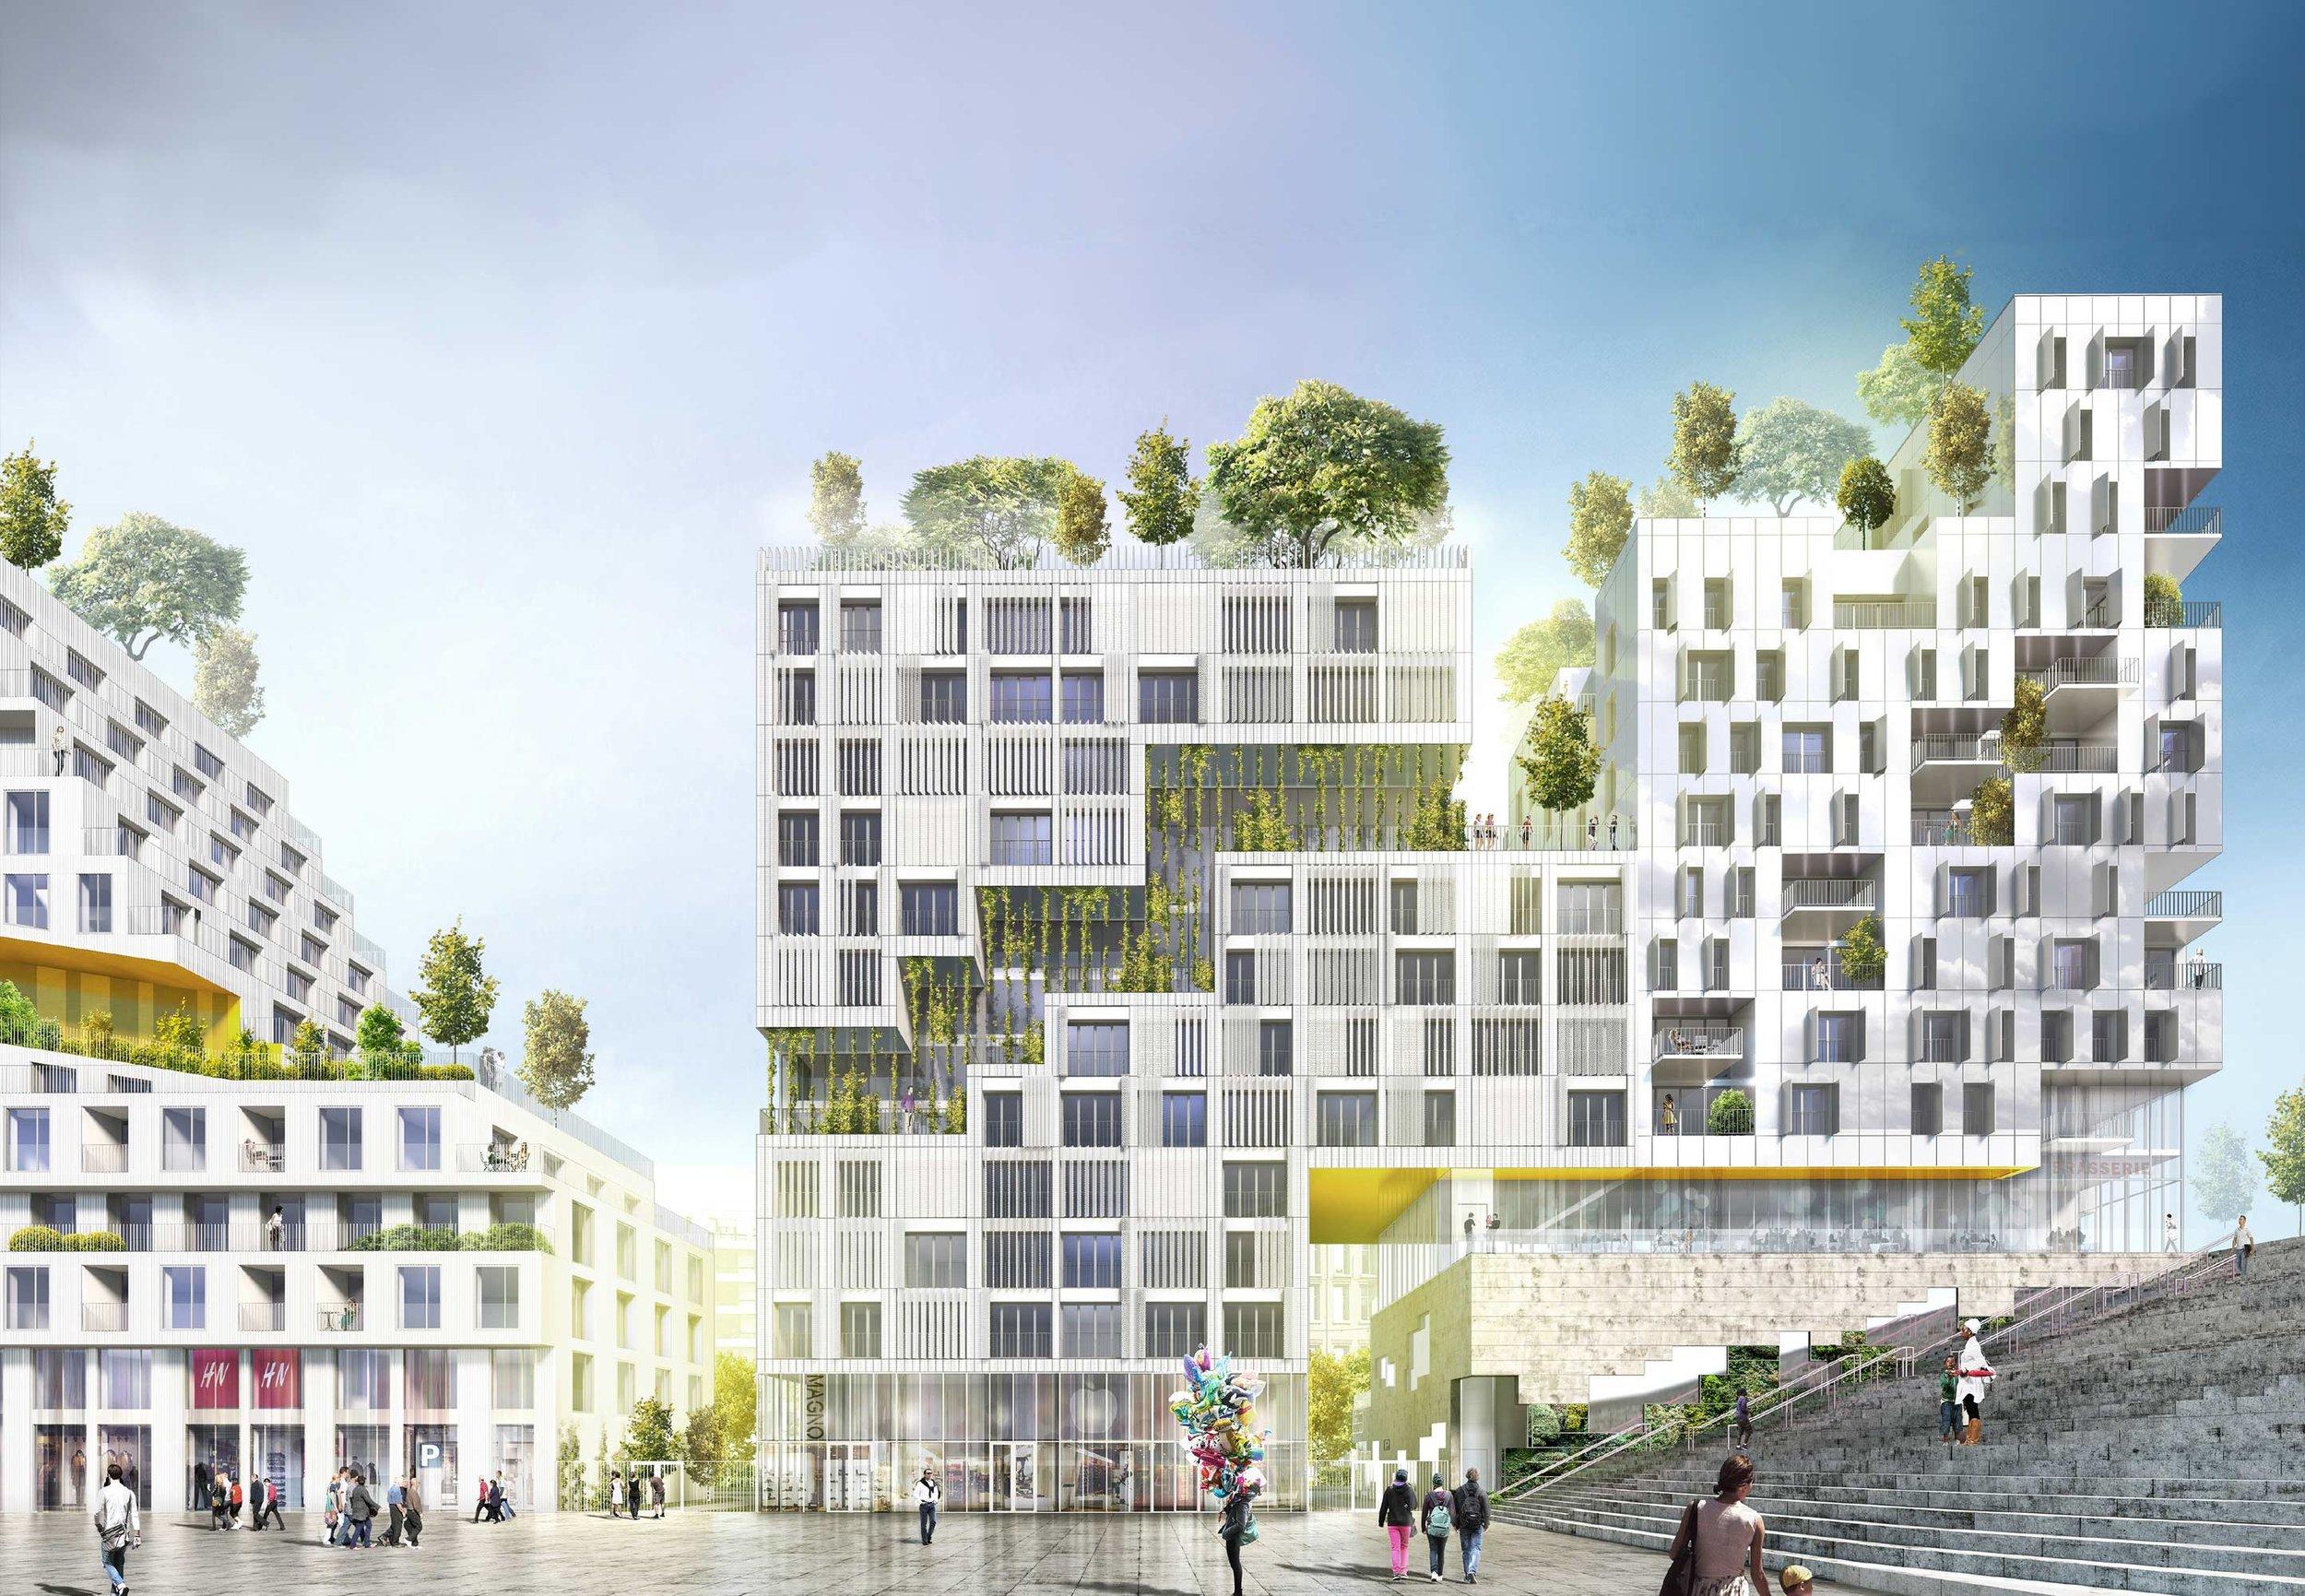 Residence-Paris-Perspective-01.jpg